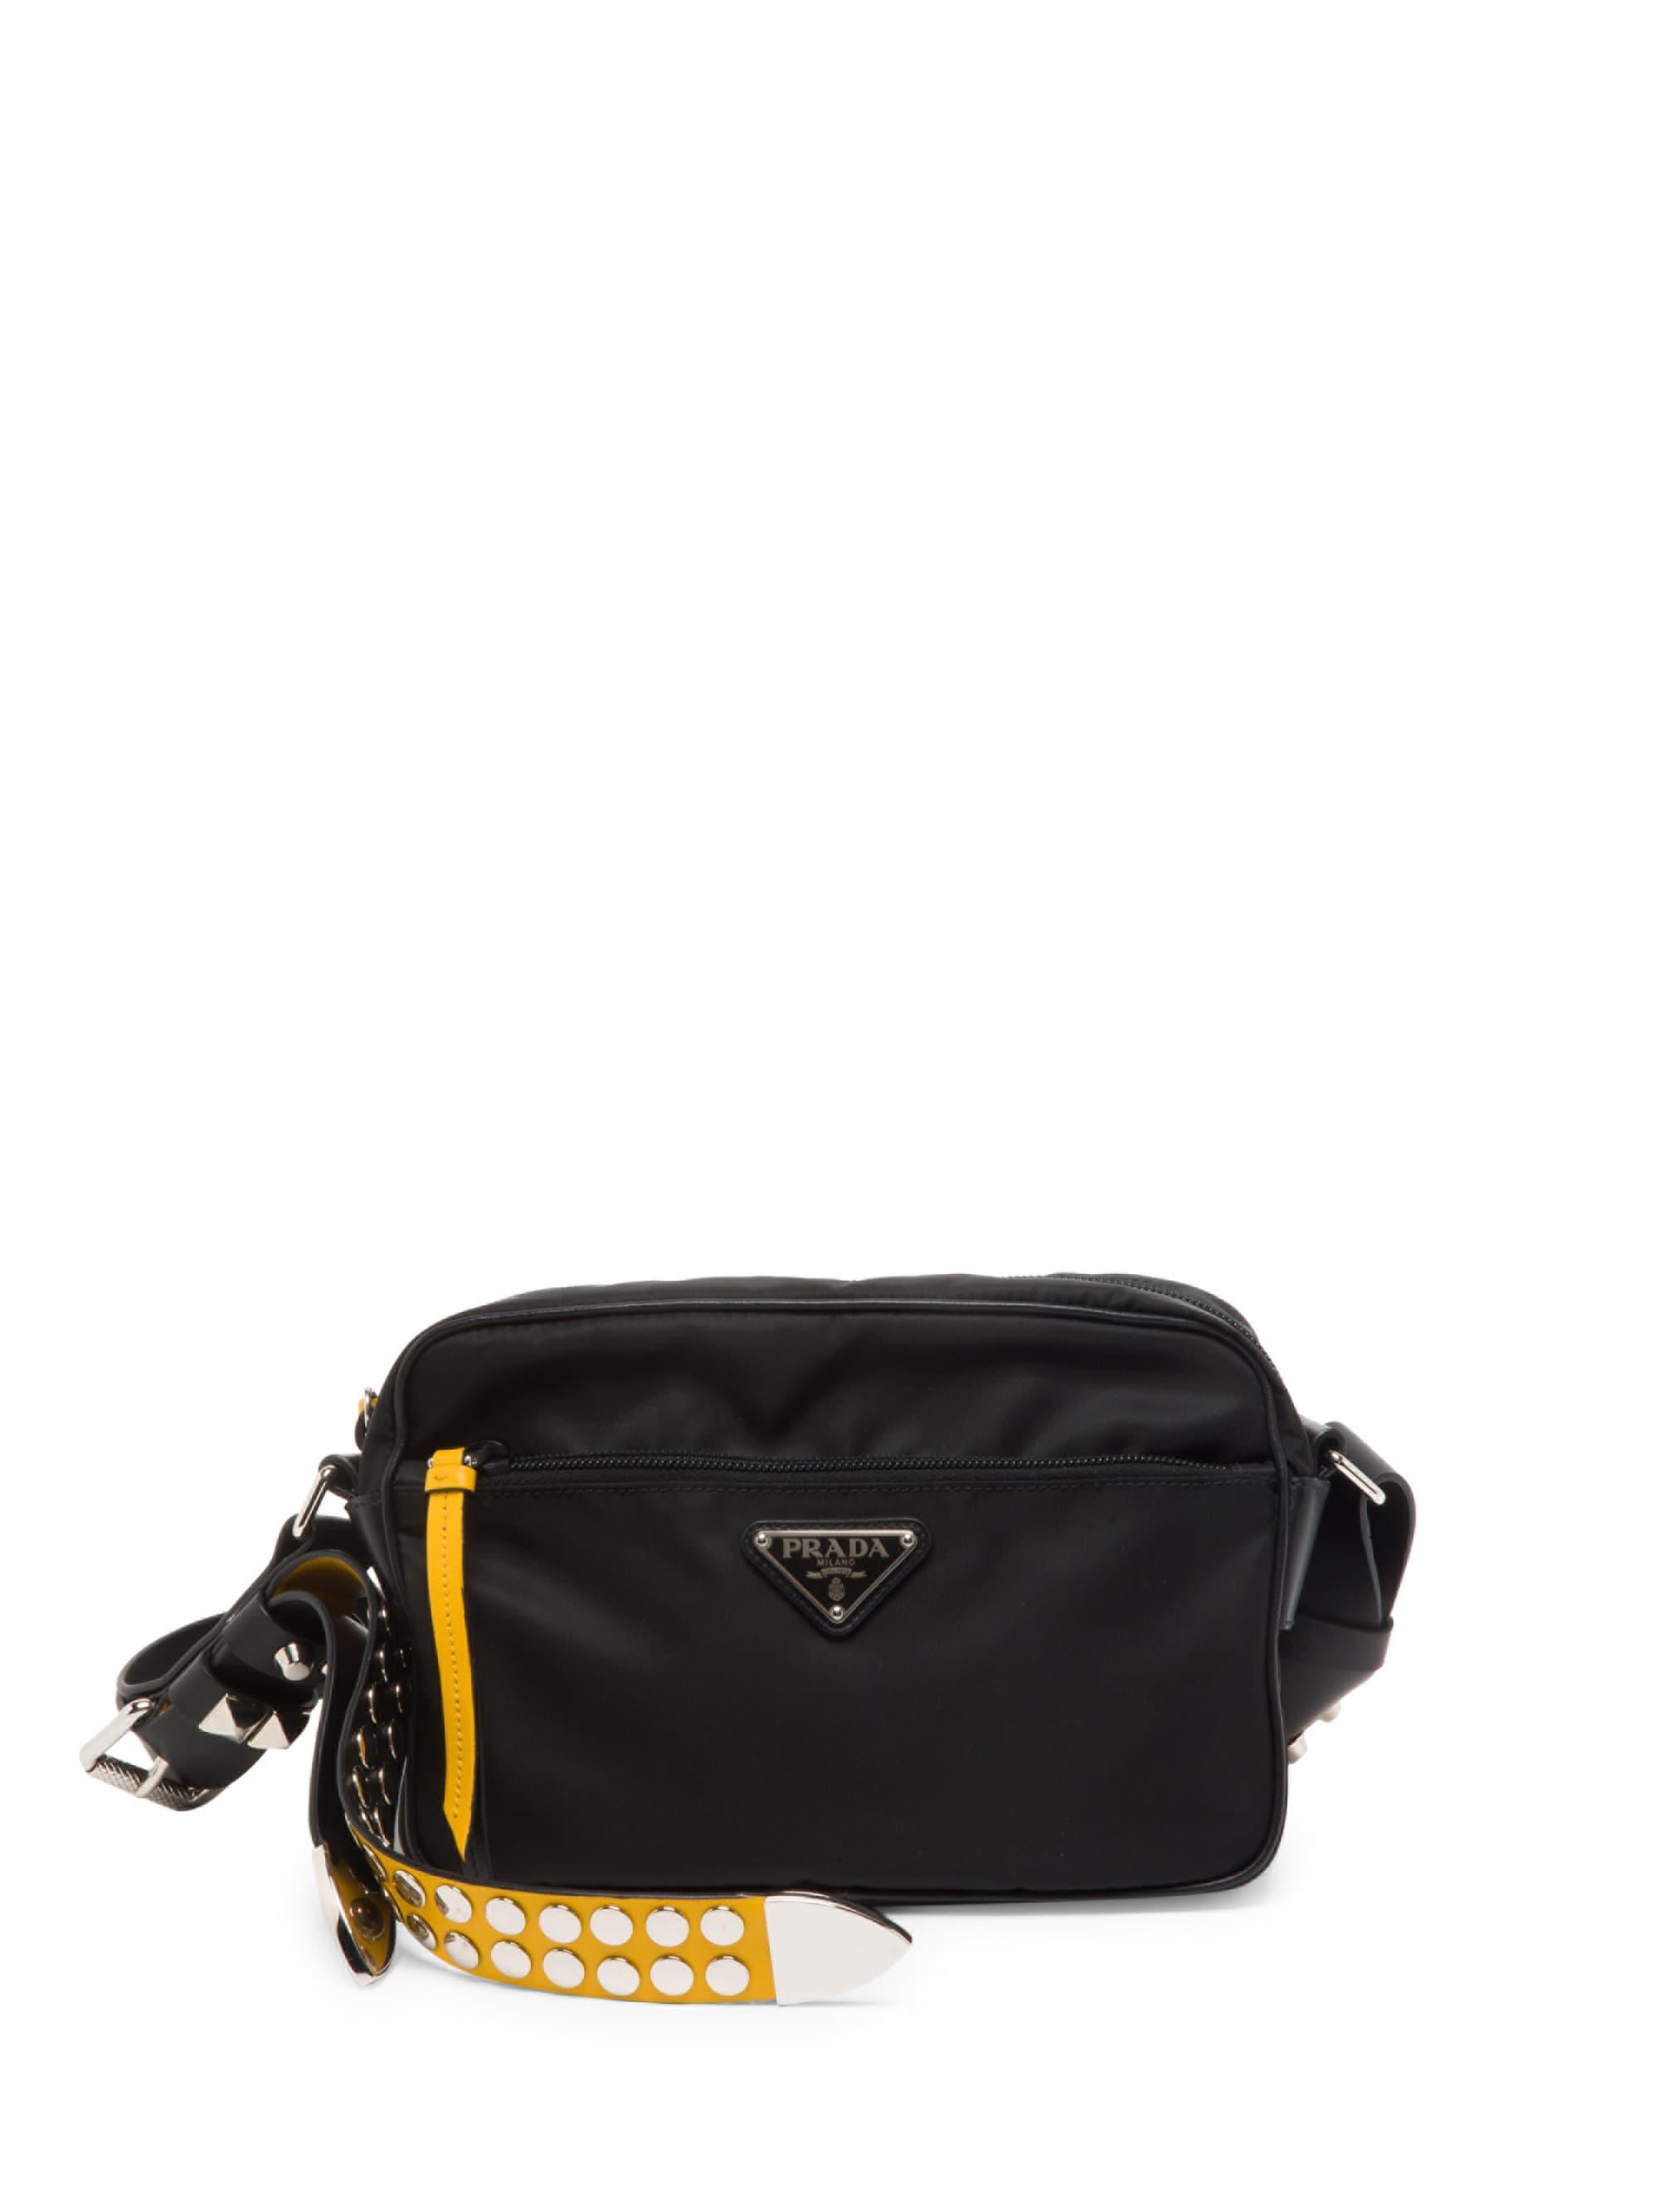 9db750109d99 ... new zealand sweden prada black nylon shoulder bag with studding lyst.  view fullscreen ecee4 5d90a